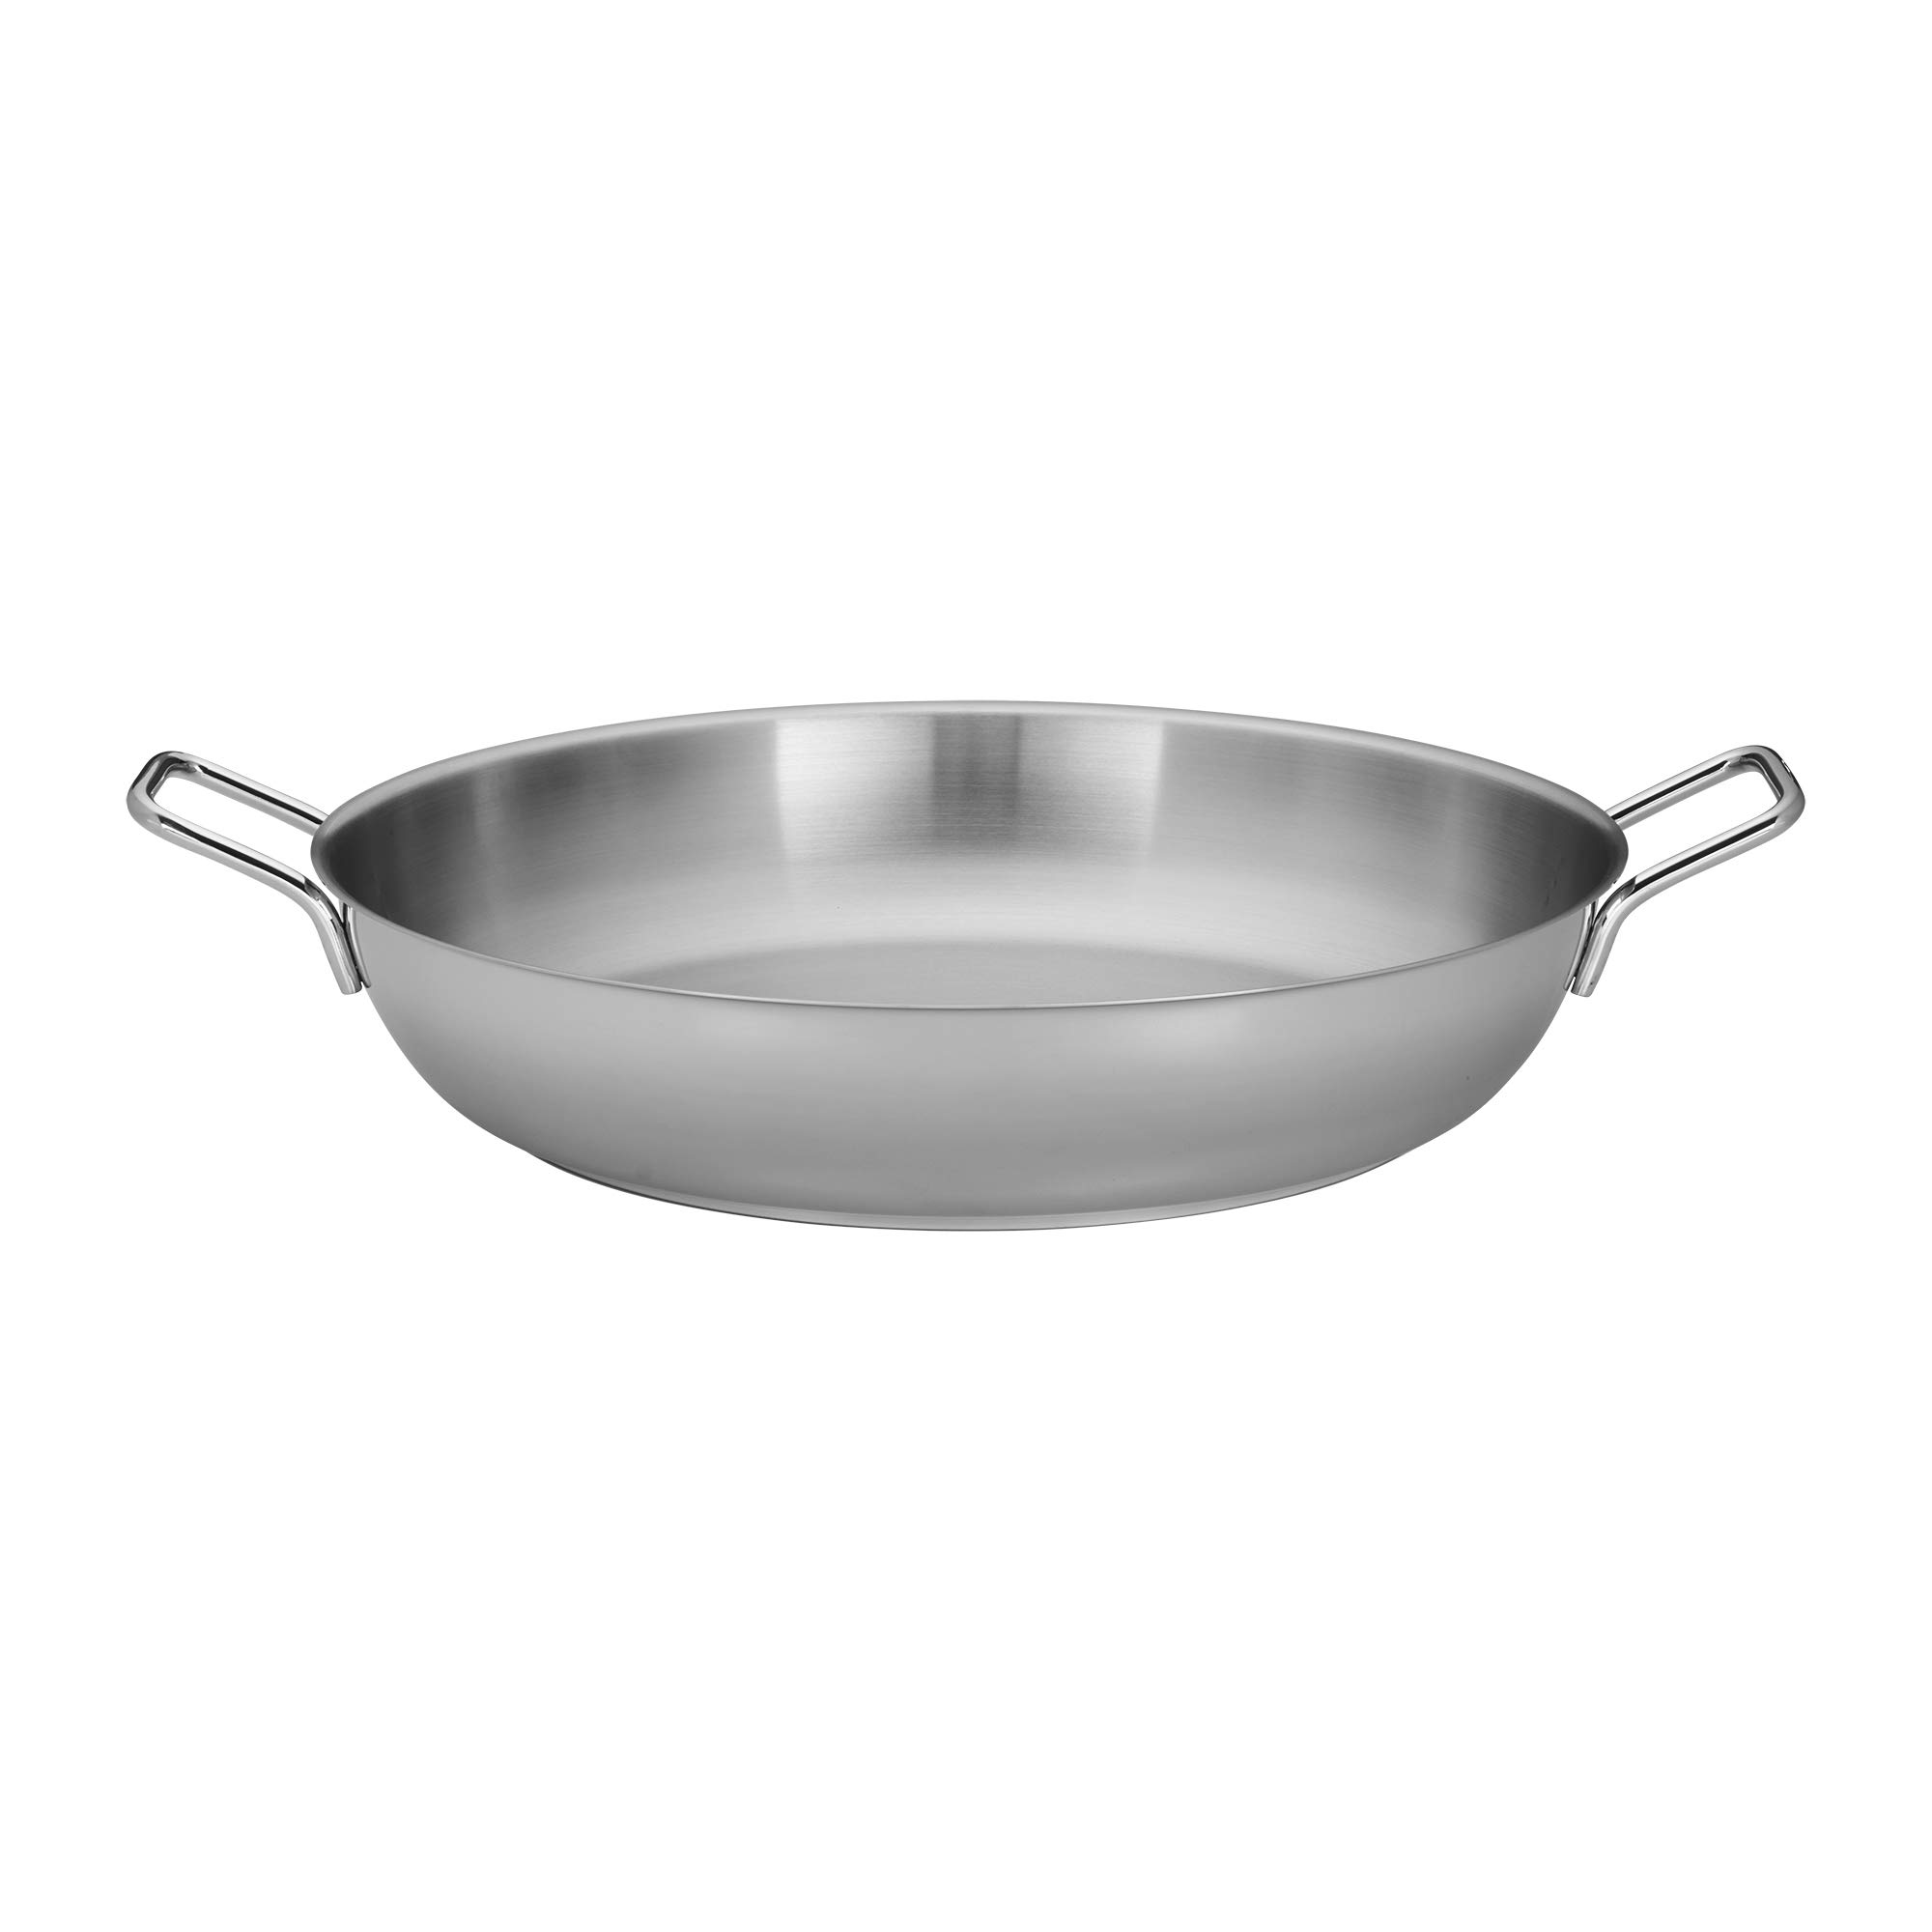 Demeyere Resto Paella Pan, 14.8 qt.